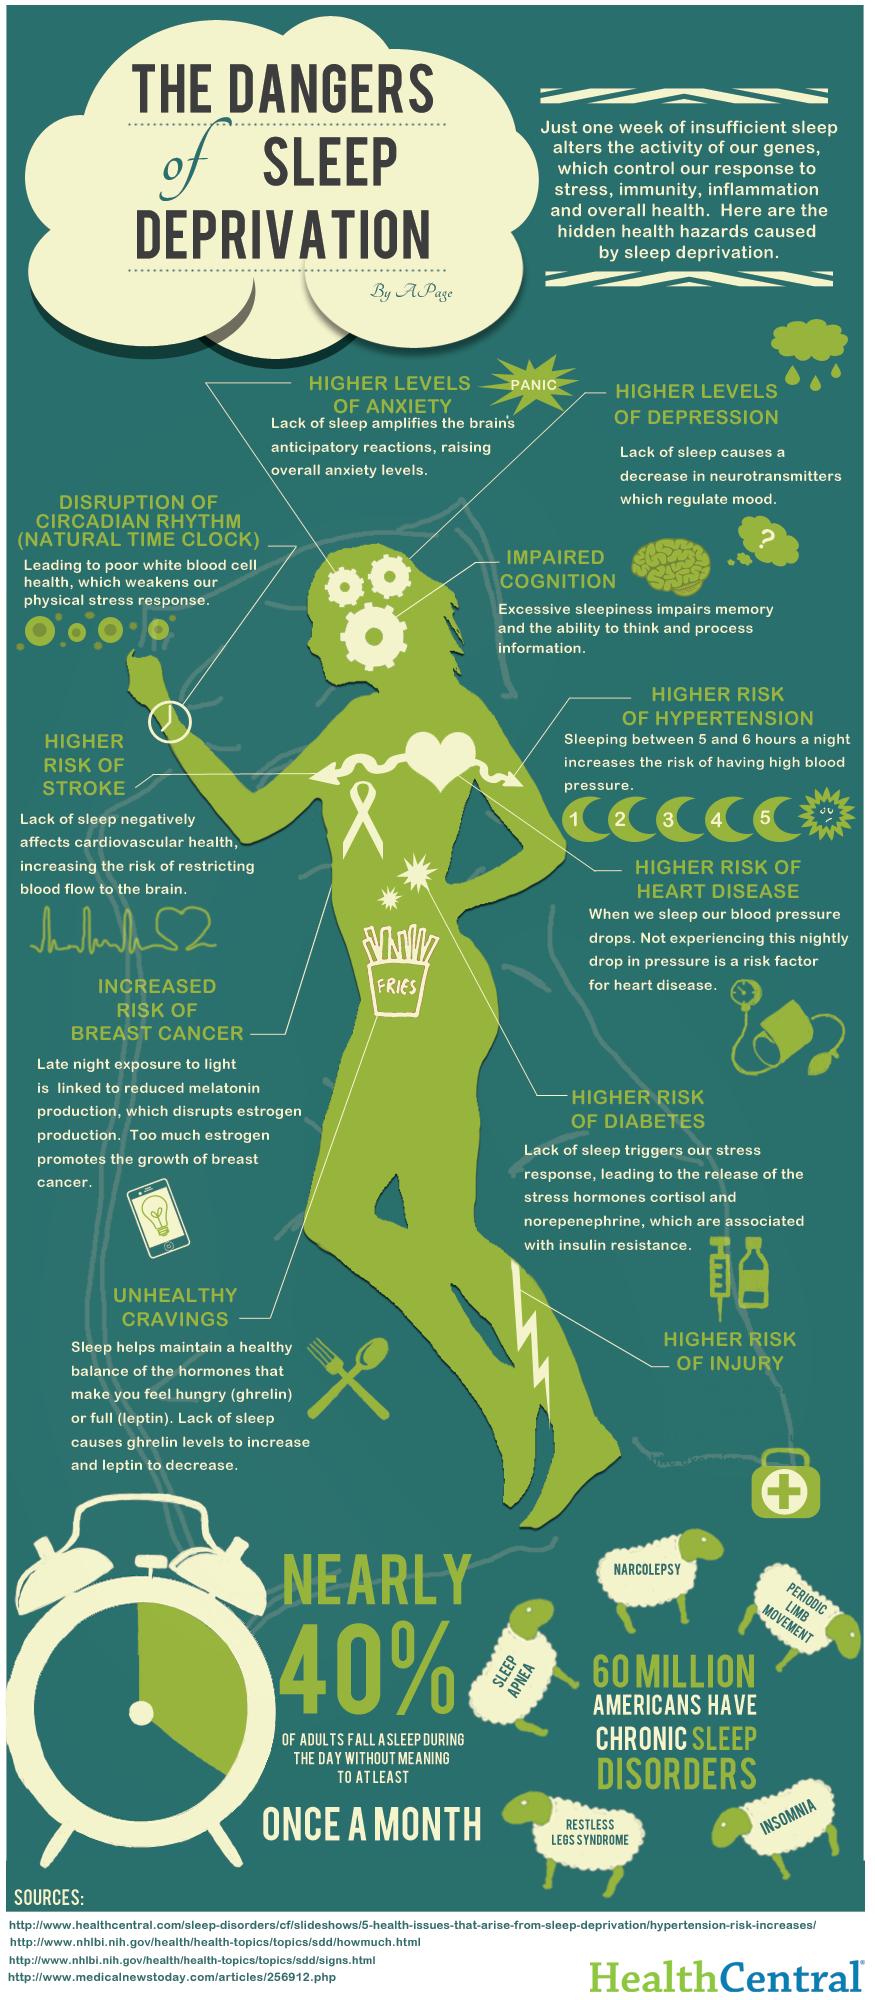 Surprising Dangers of Sleep Deprivation Infographic